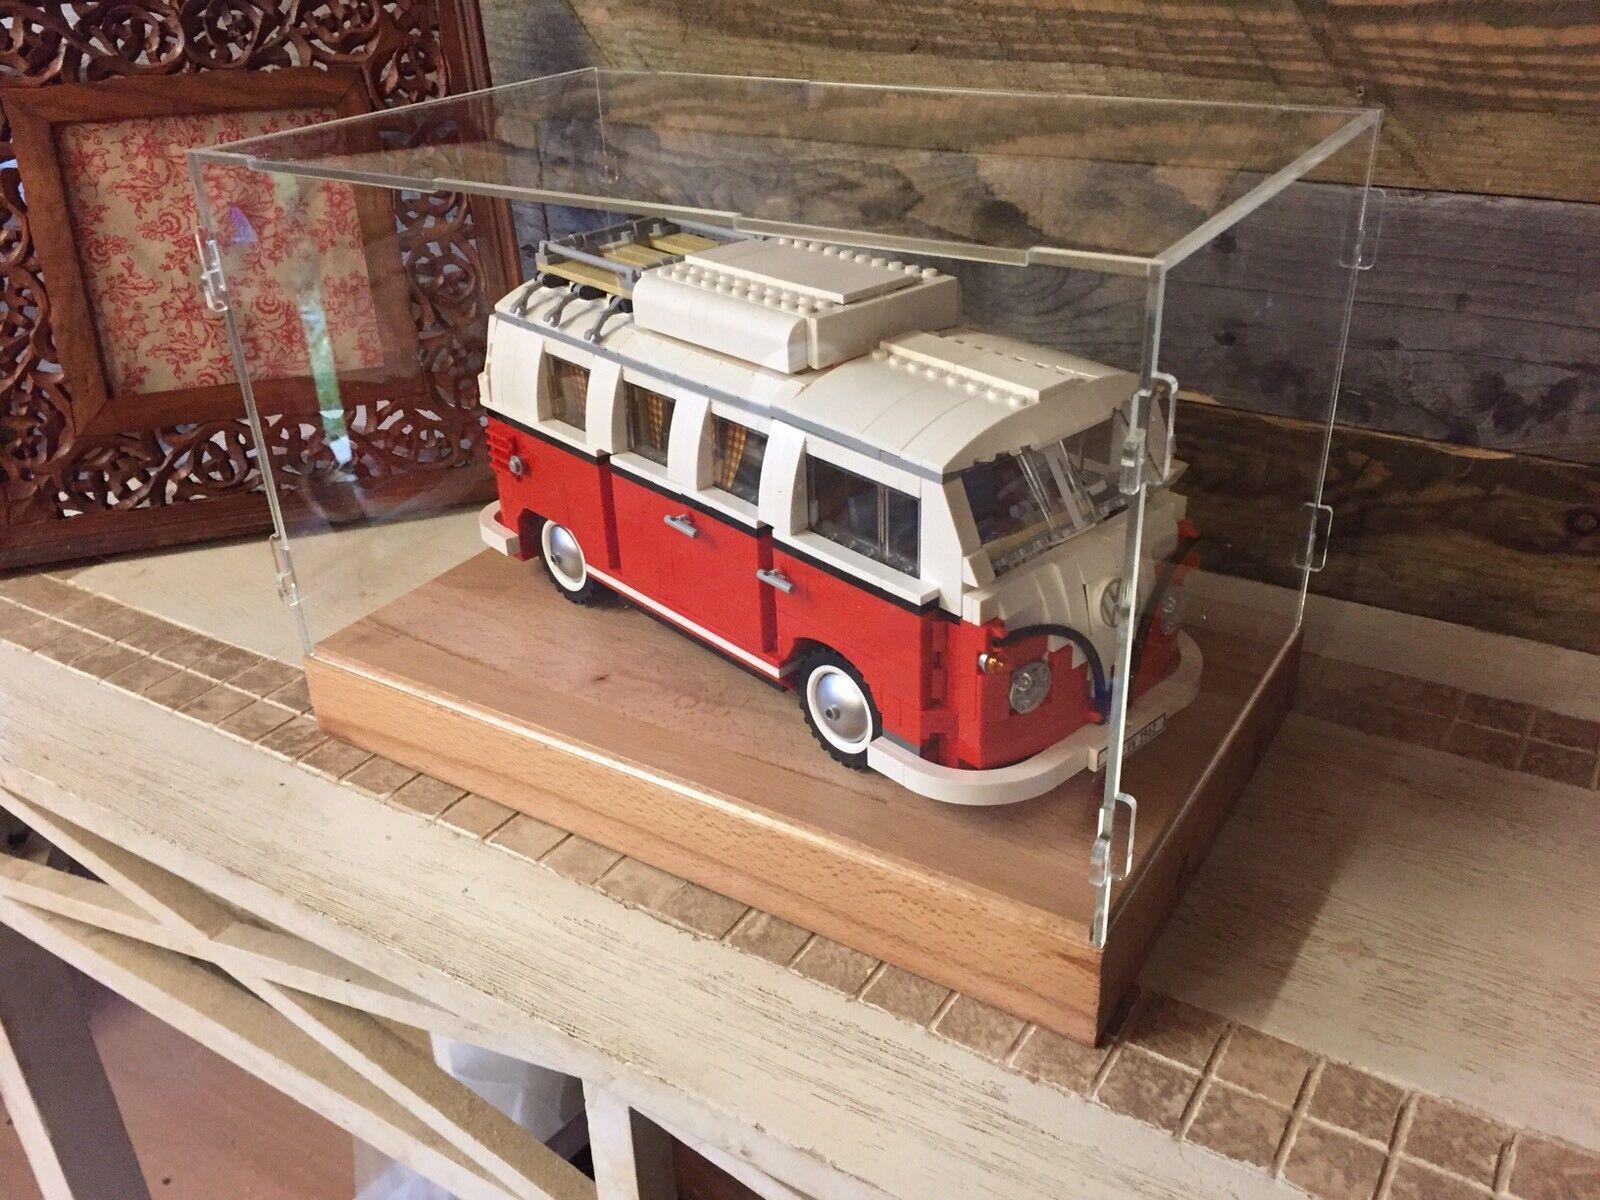 Deluxe Hardwood & Clear Acrylic Display Case for LEGO VW Camper van